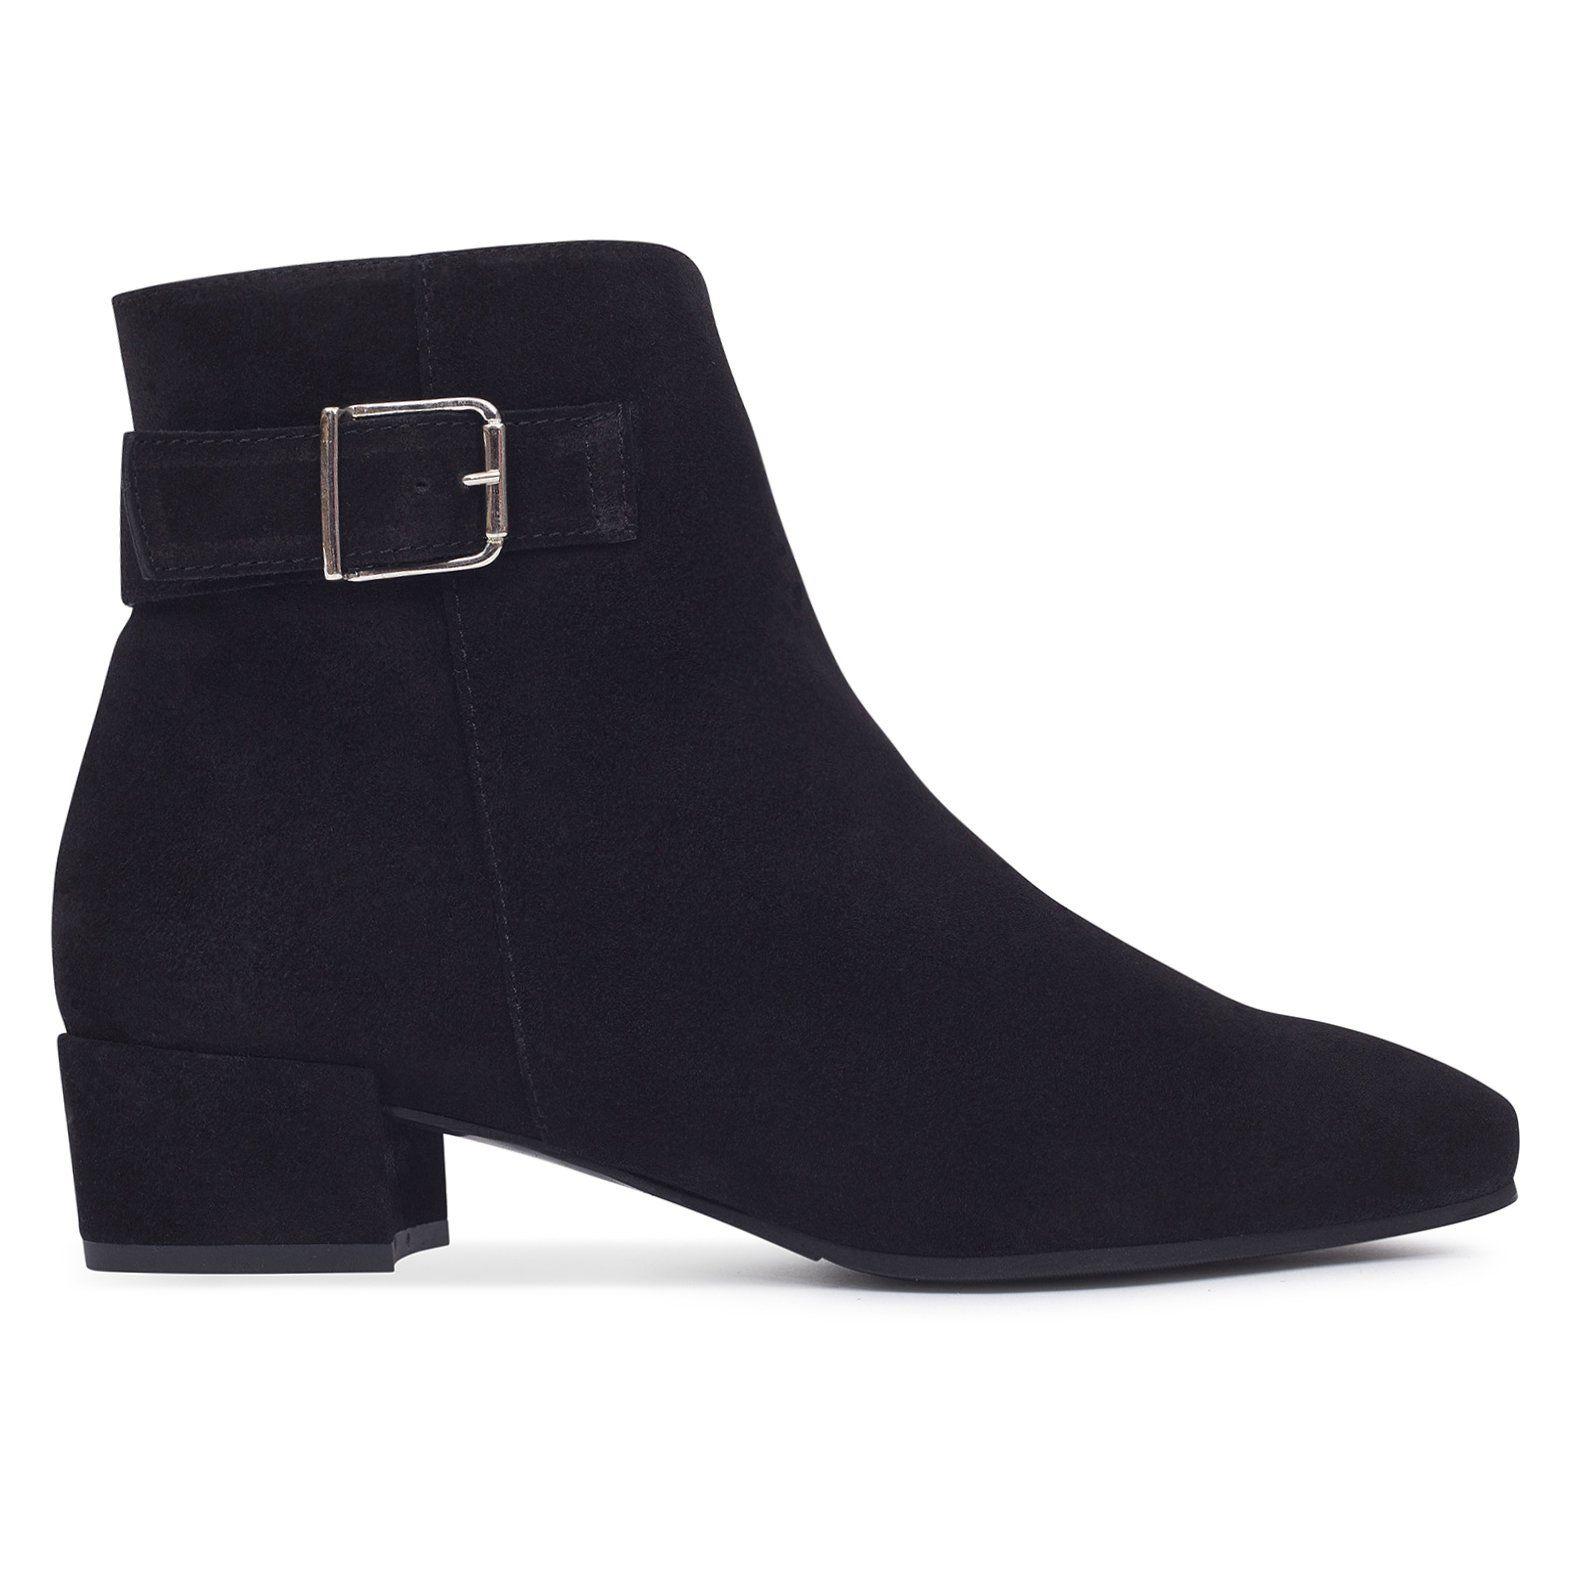 b7b0ccc7f2b Botín de mujer NEGRO Piel – made in Spain – Zapatos miMaO Online – miMaO  ShopOnline